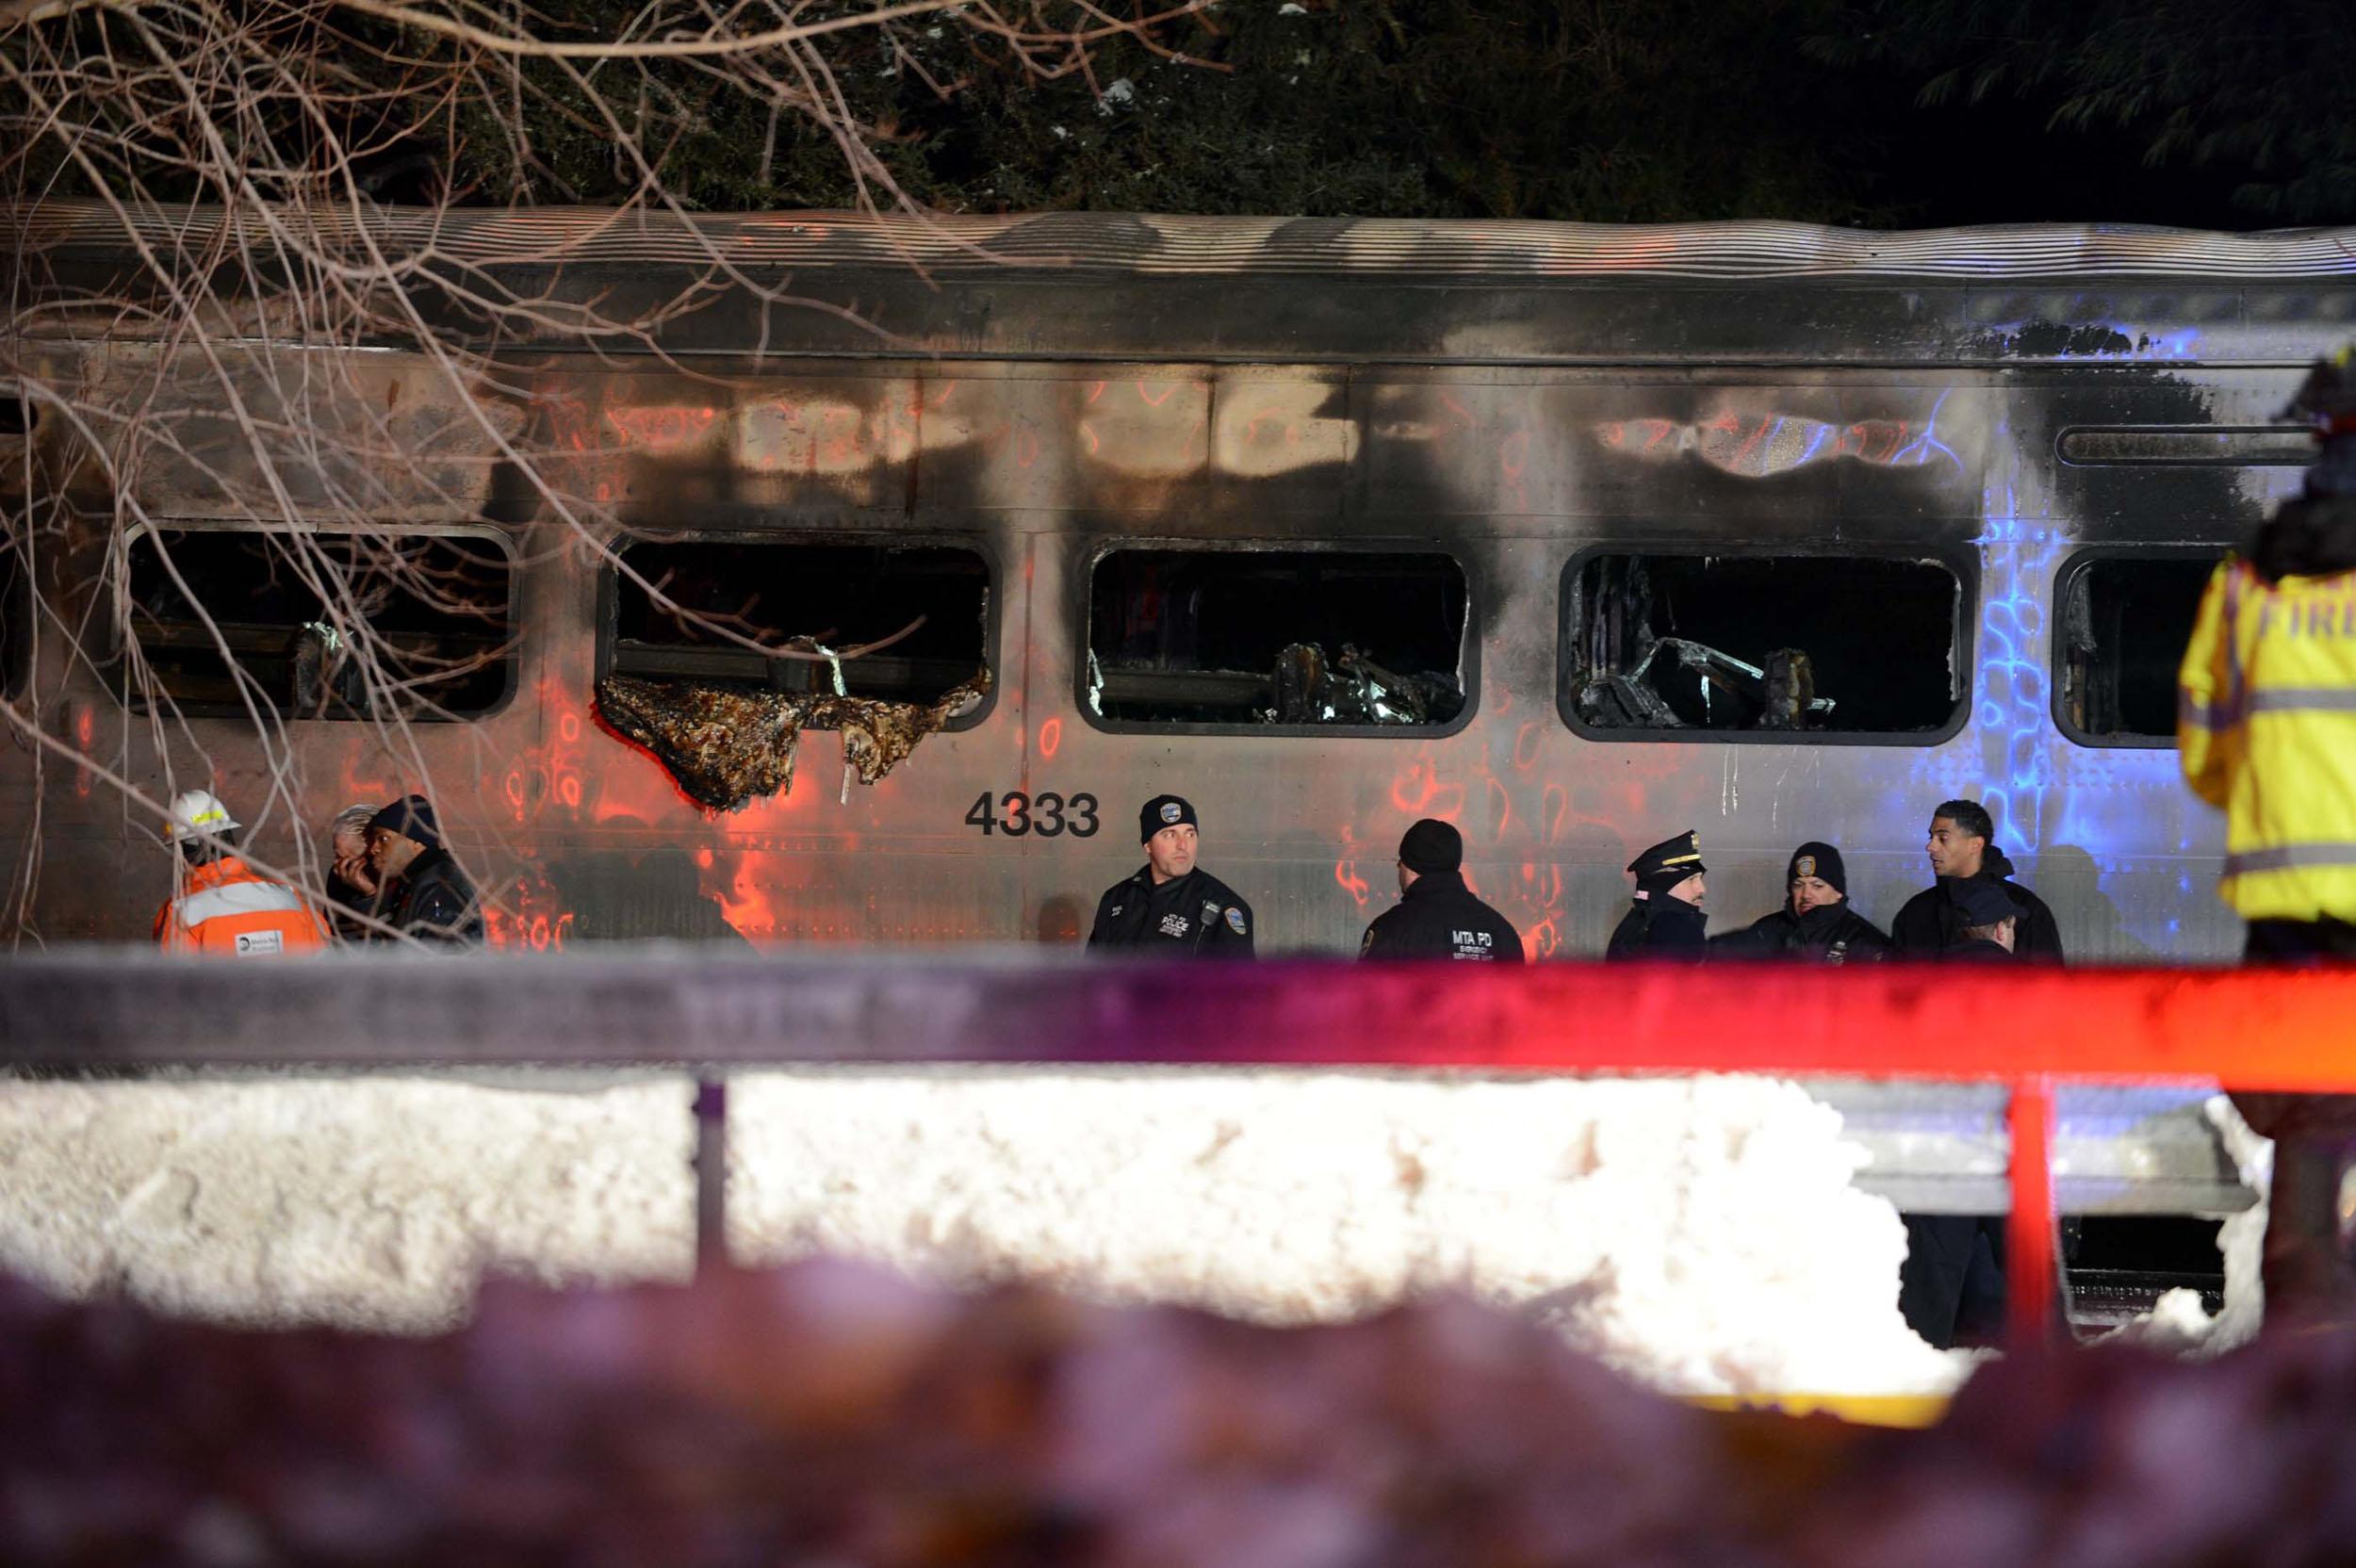 Seven people were killed, around 12 injured in a Metro-North crash in Valhalla, N.Y. on Feb. 3, 2015.